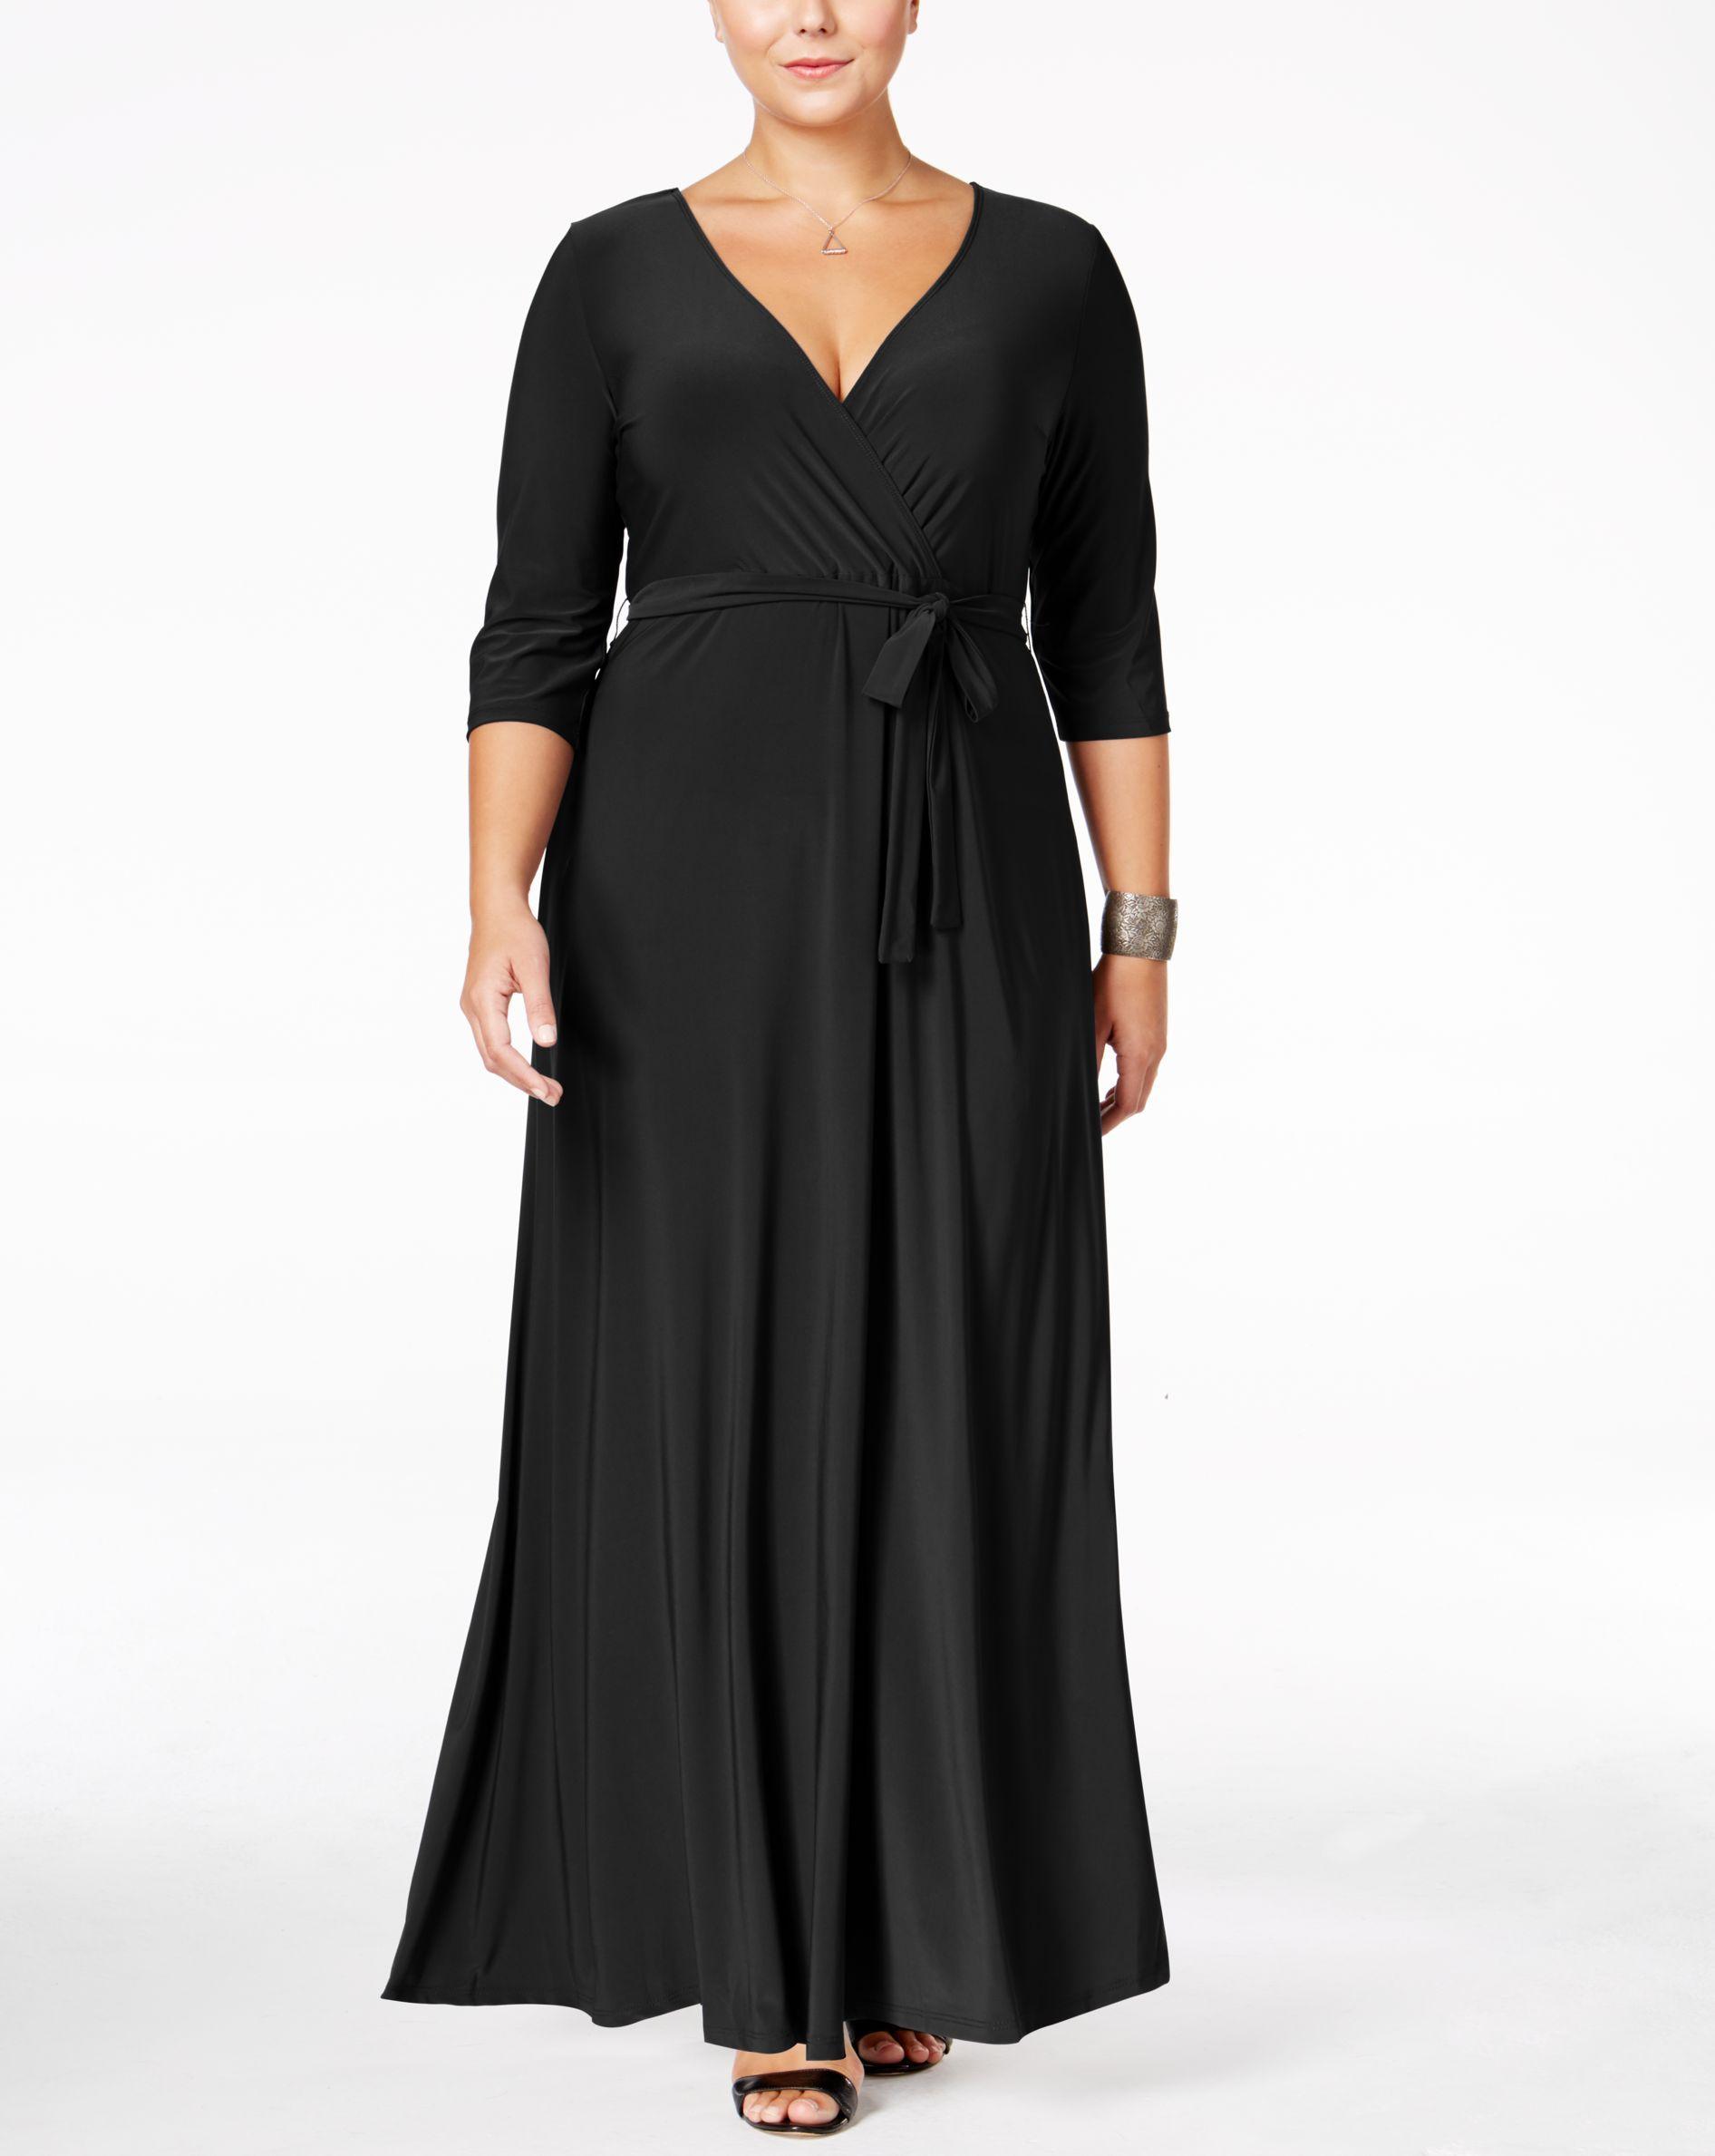 Love Squared Plus Size Faux Wrap Maxi Dress Maxi Dress Maxi Wrap Dress Plus Size Maxi Dresses [ 2378 x 1892 Pixel ]